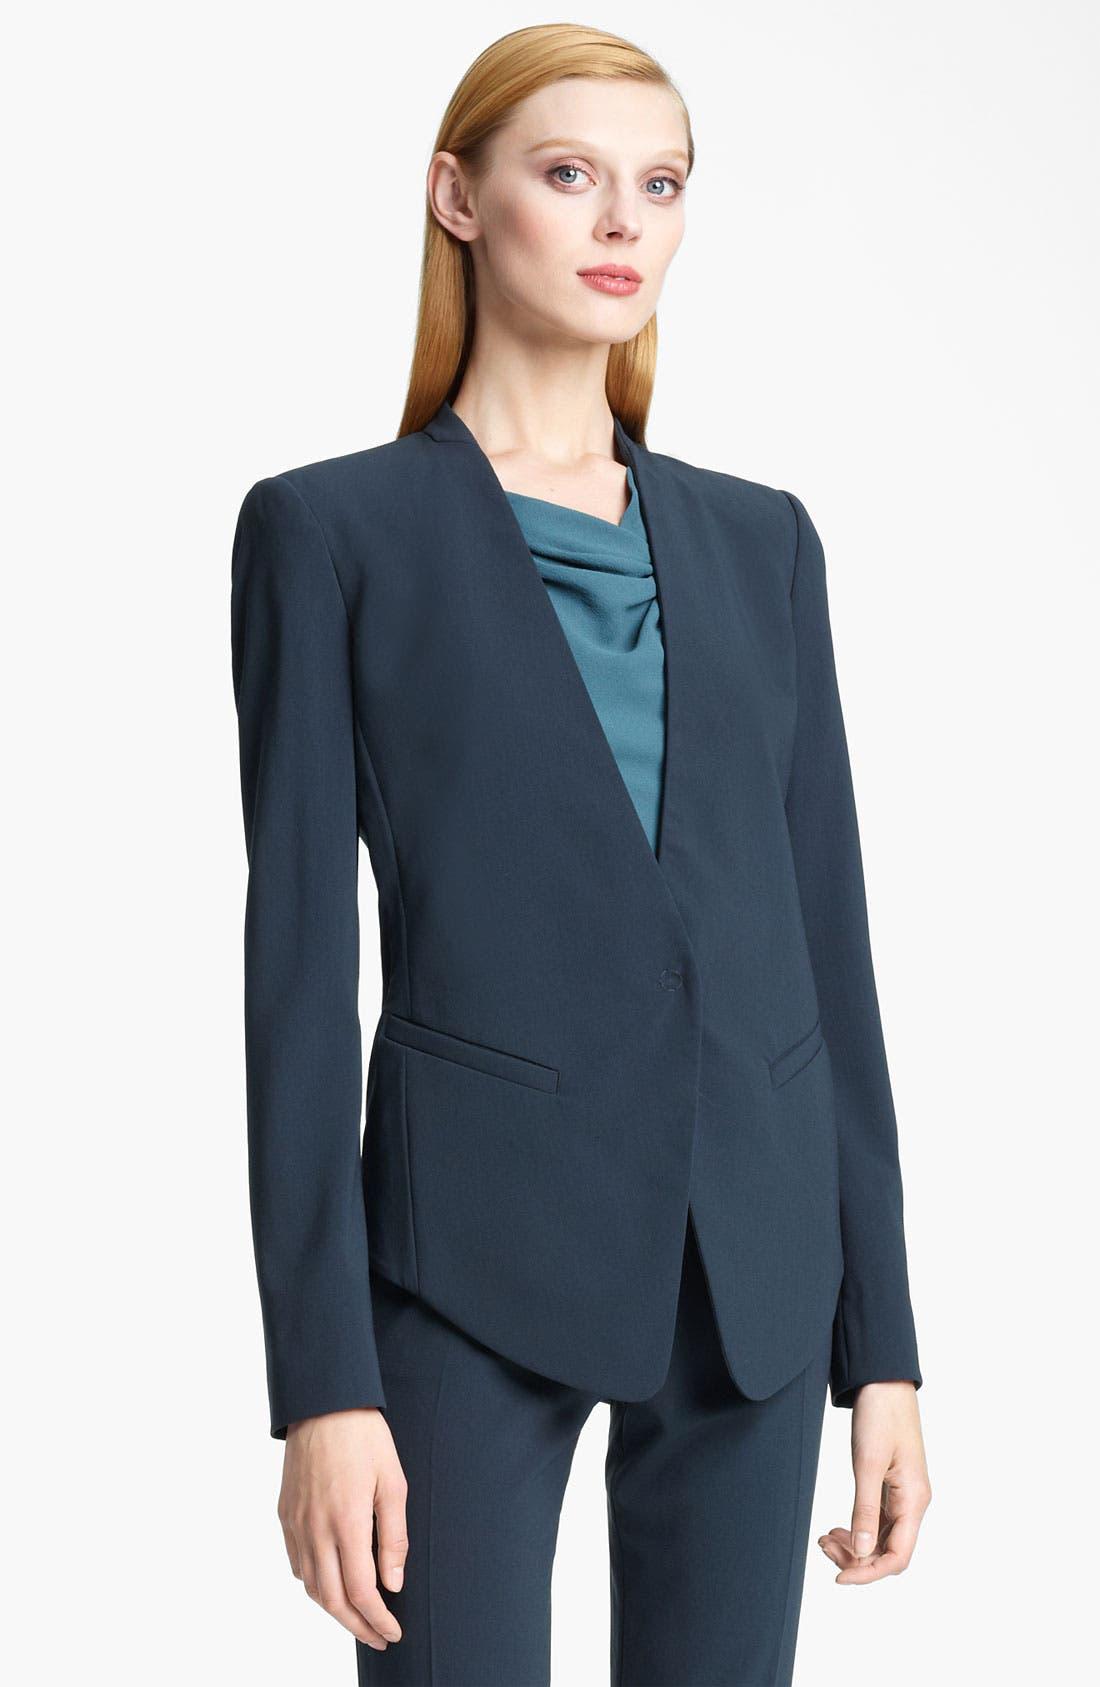 Alternate Image 1 Selected - Armani Collezioni Collarless Crepe Jacket